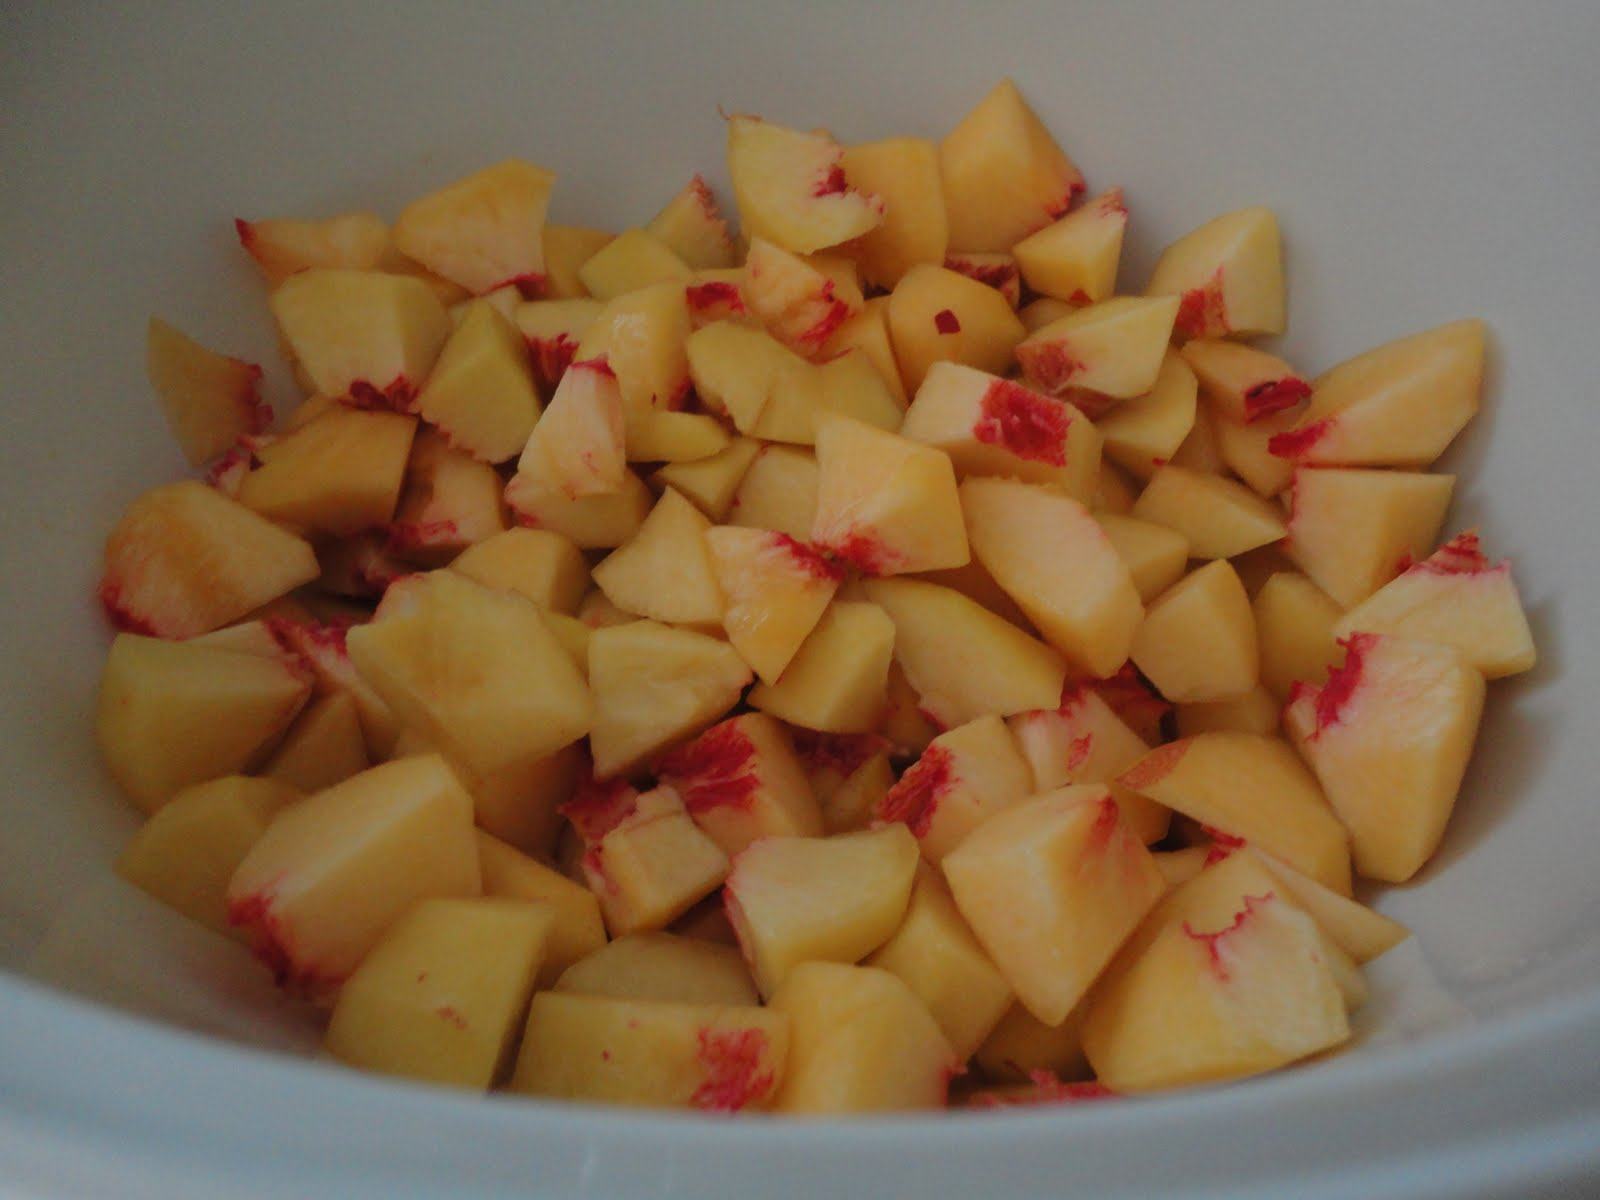 Elmalı Şeftalili Karışık Komposto